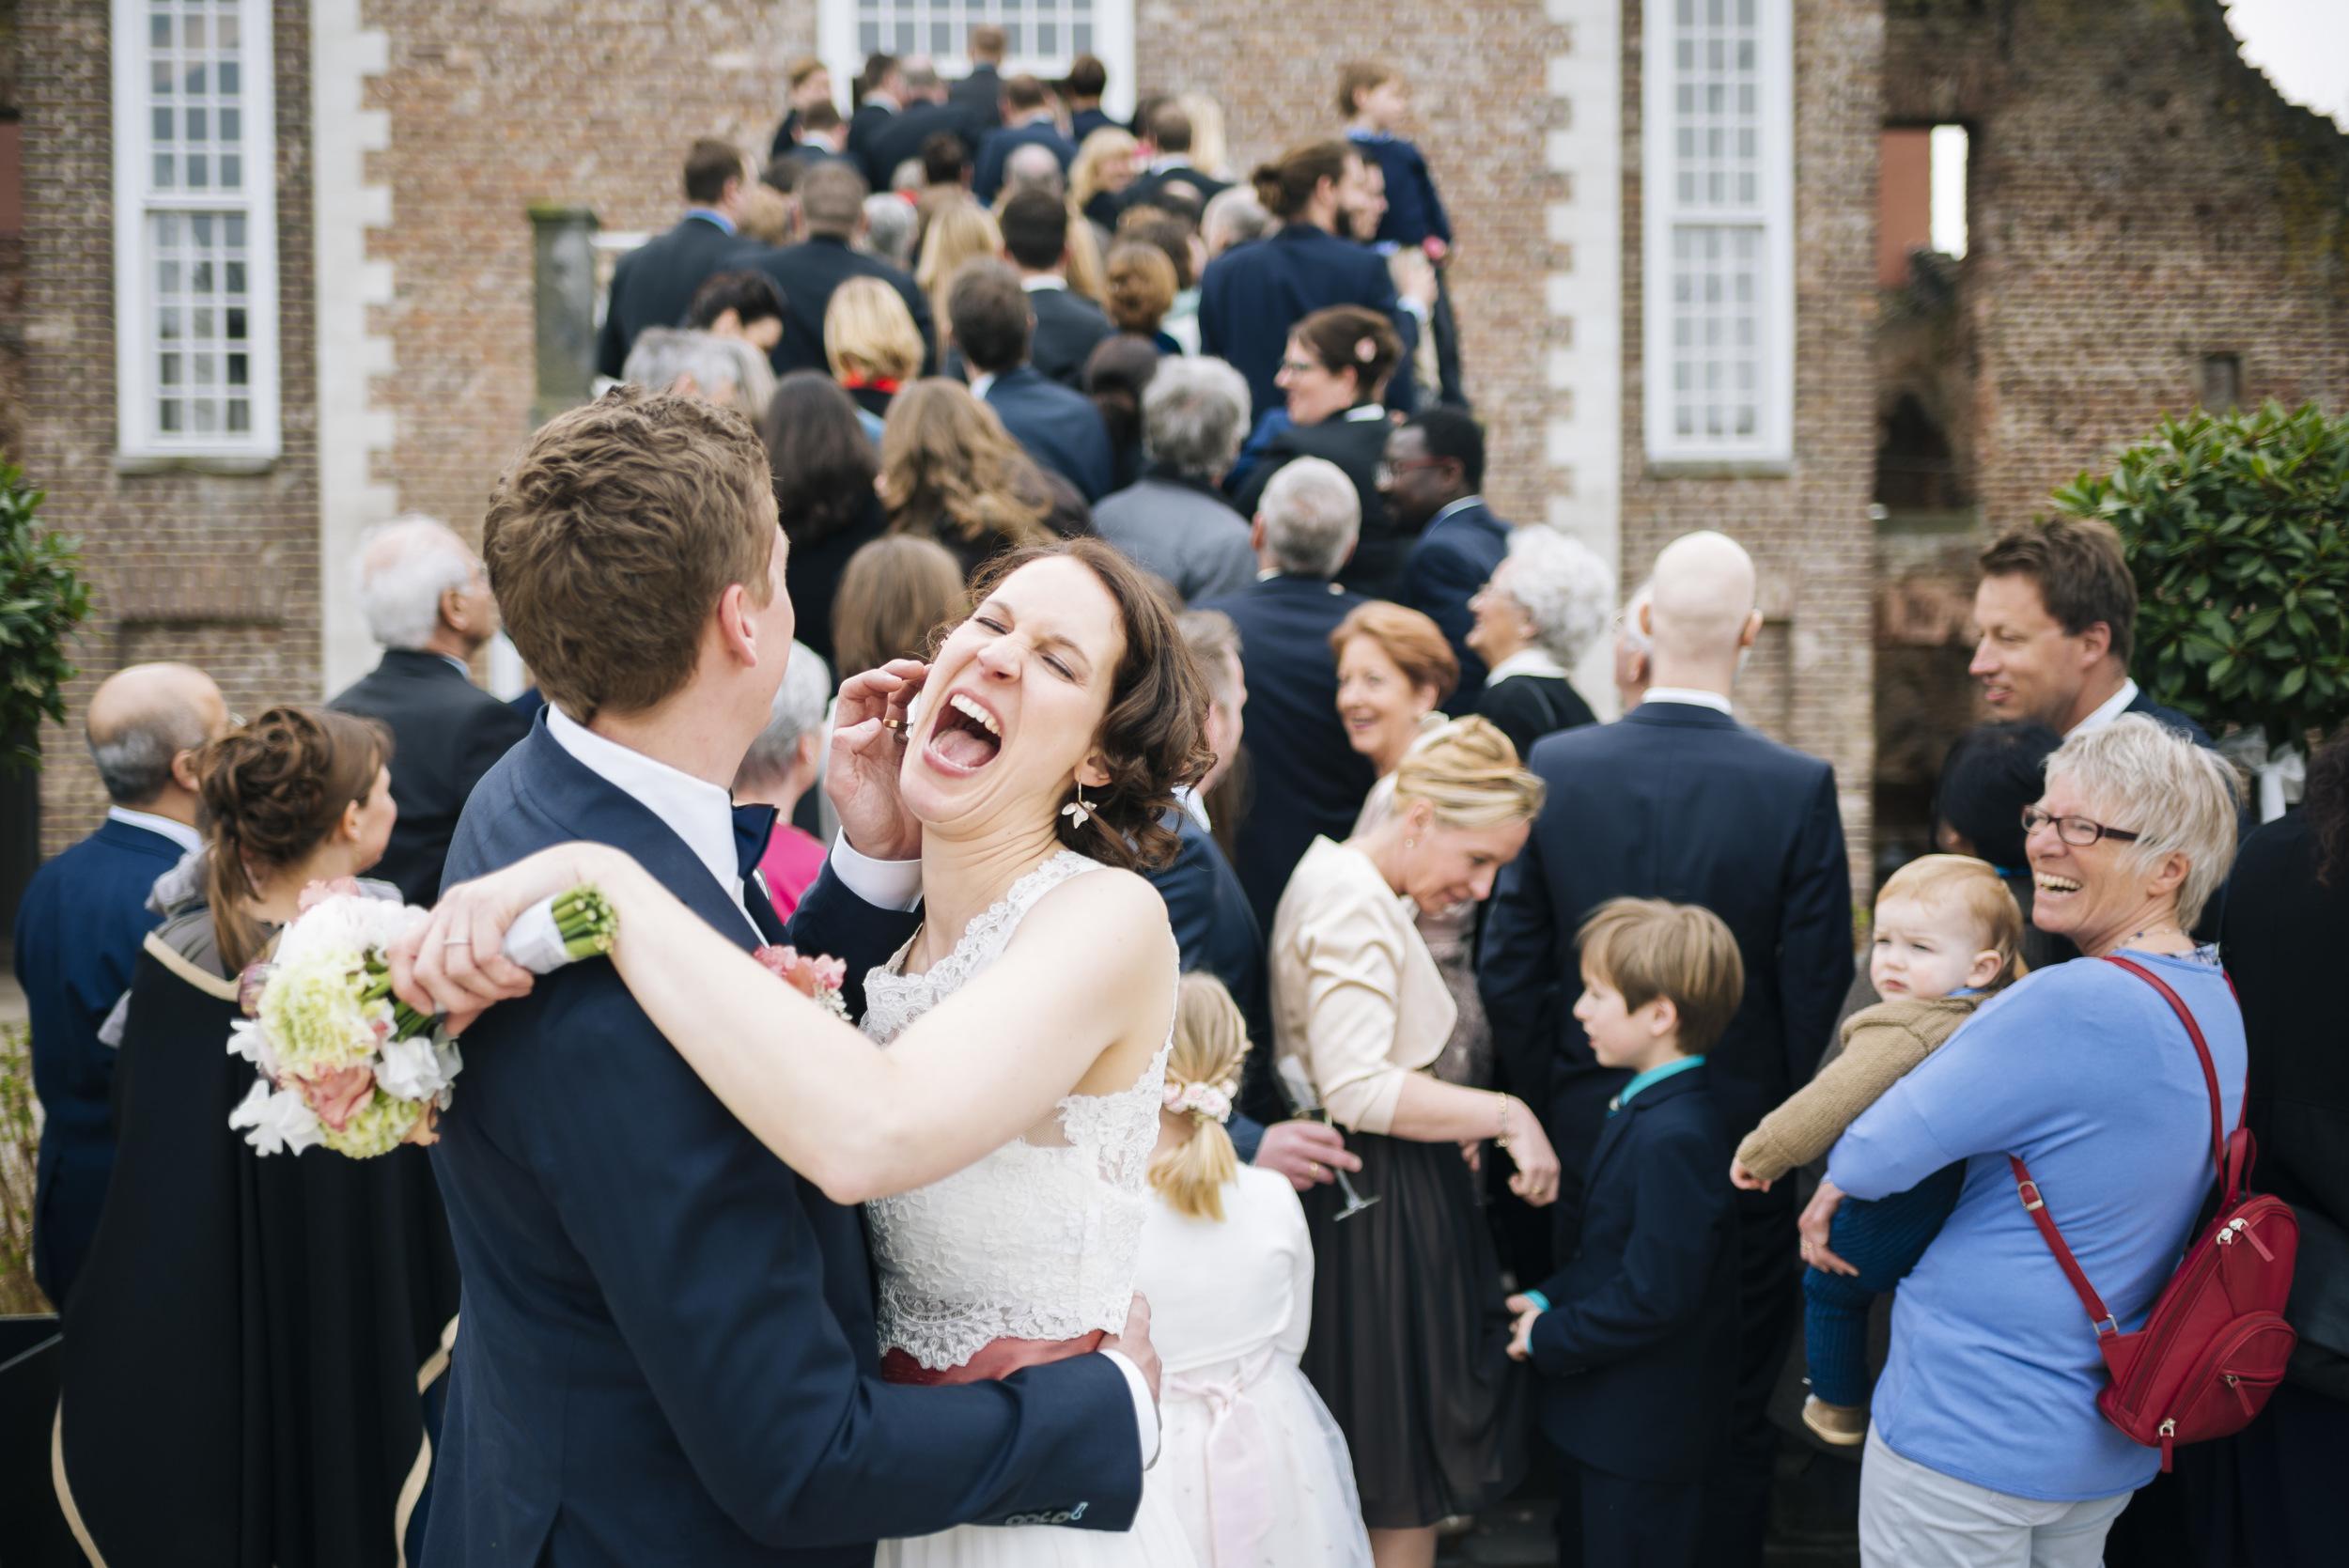 Hochzeitsfotograf-Schlossruine-Hertefeld-Weeze-103.jpg